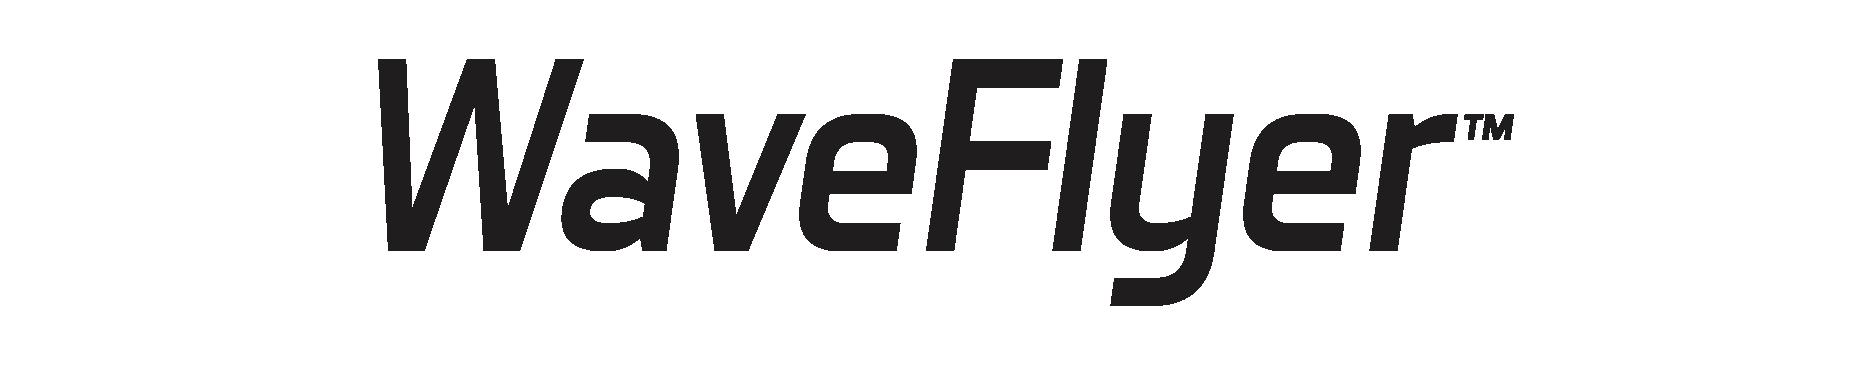 logos_black_padded_logo_white_waveflyer.png